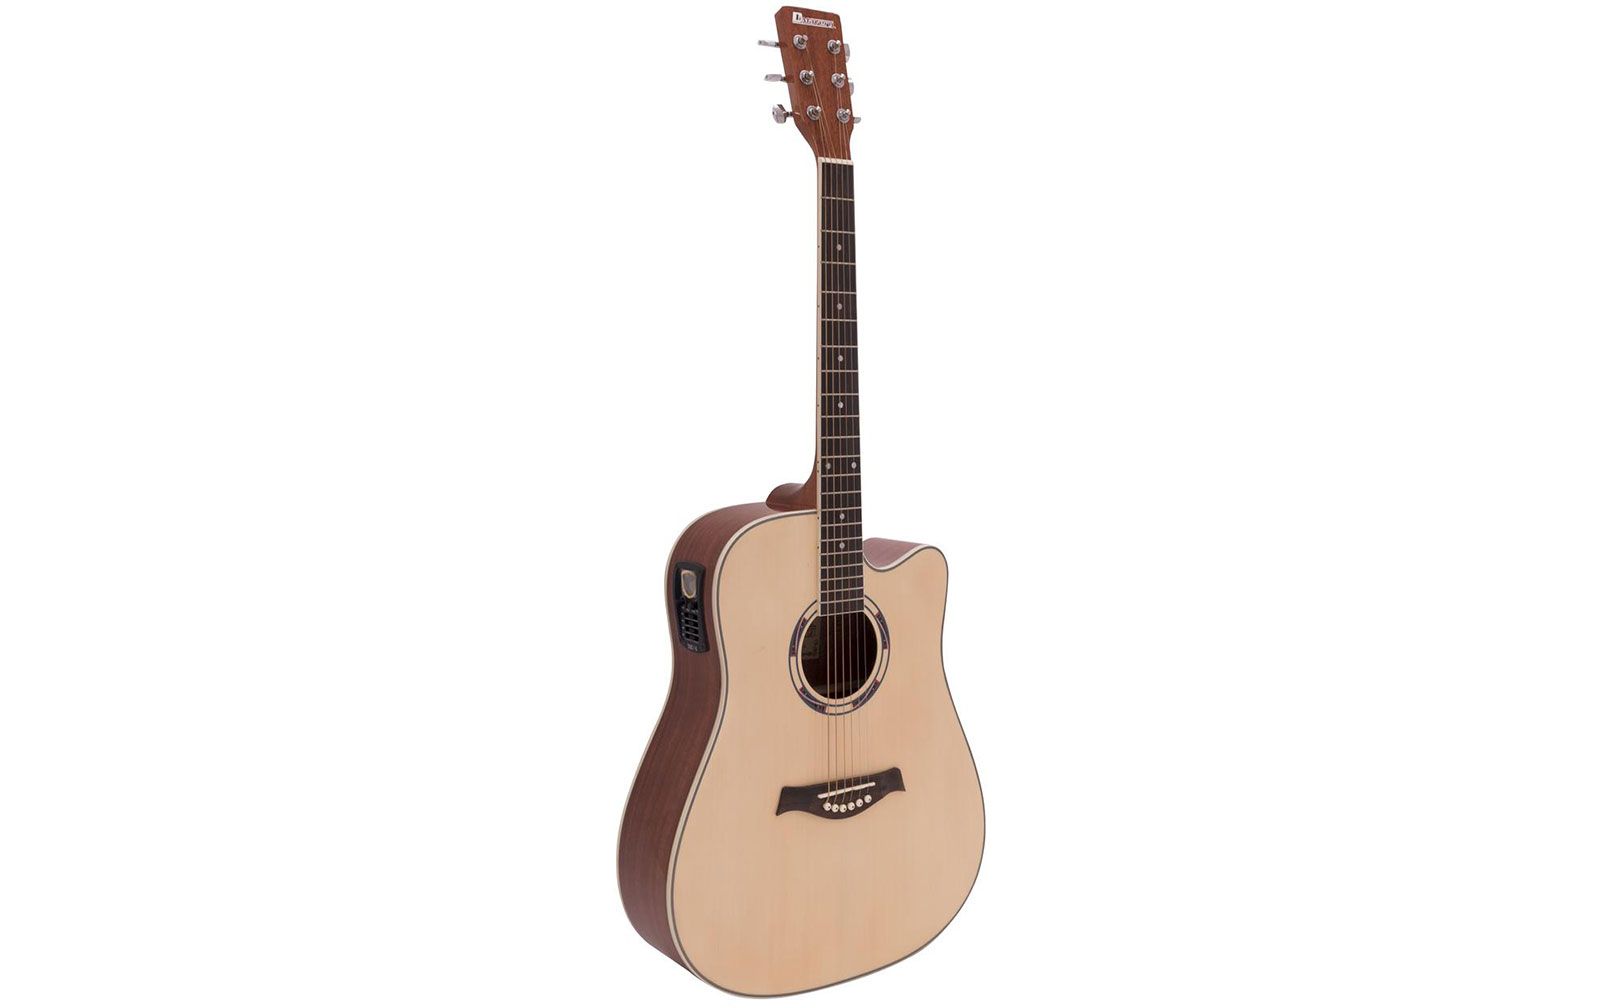 dimavery-jk-500-western-gitarre-cutaway-natur